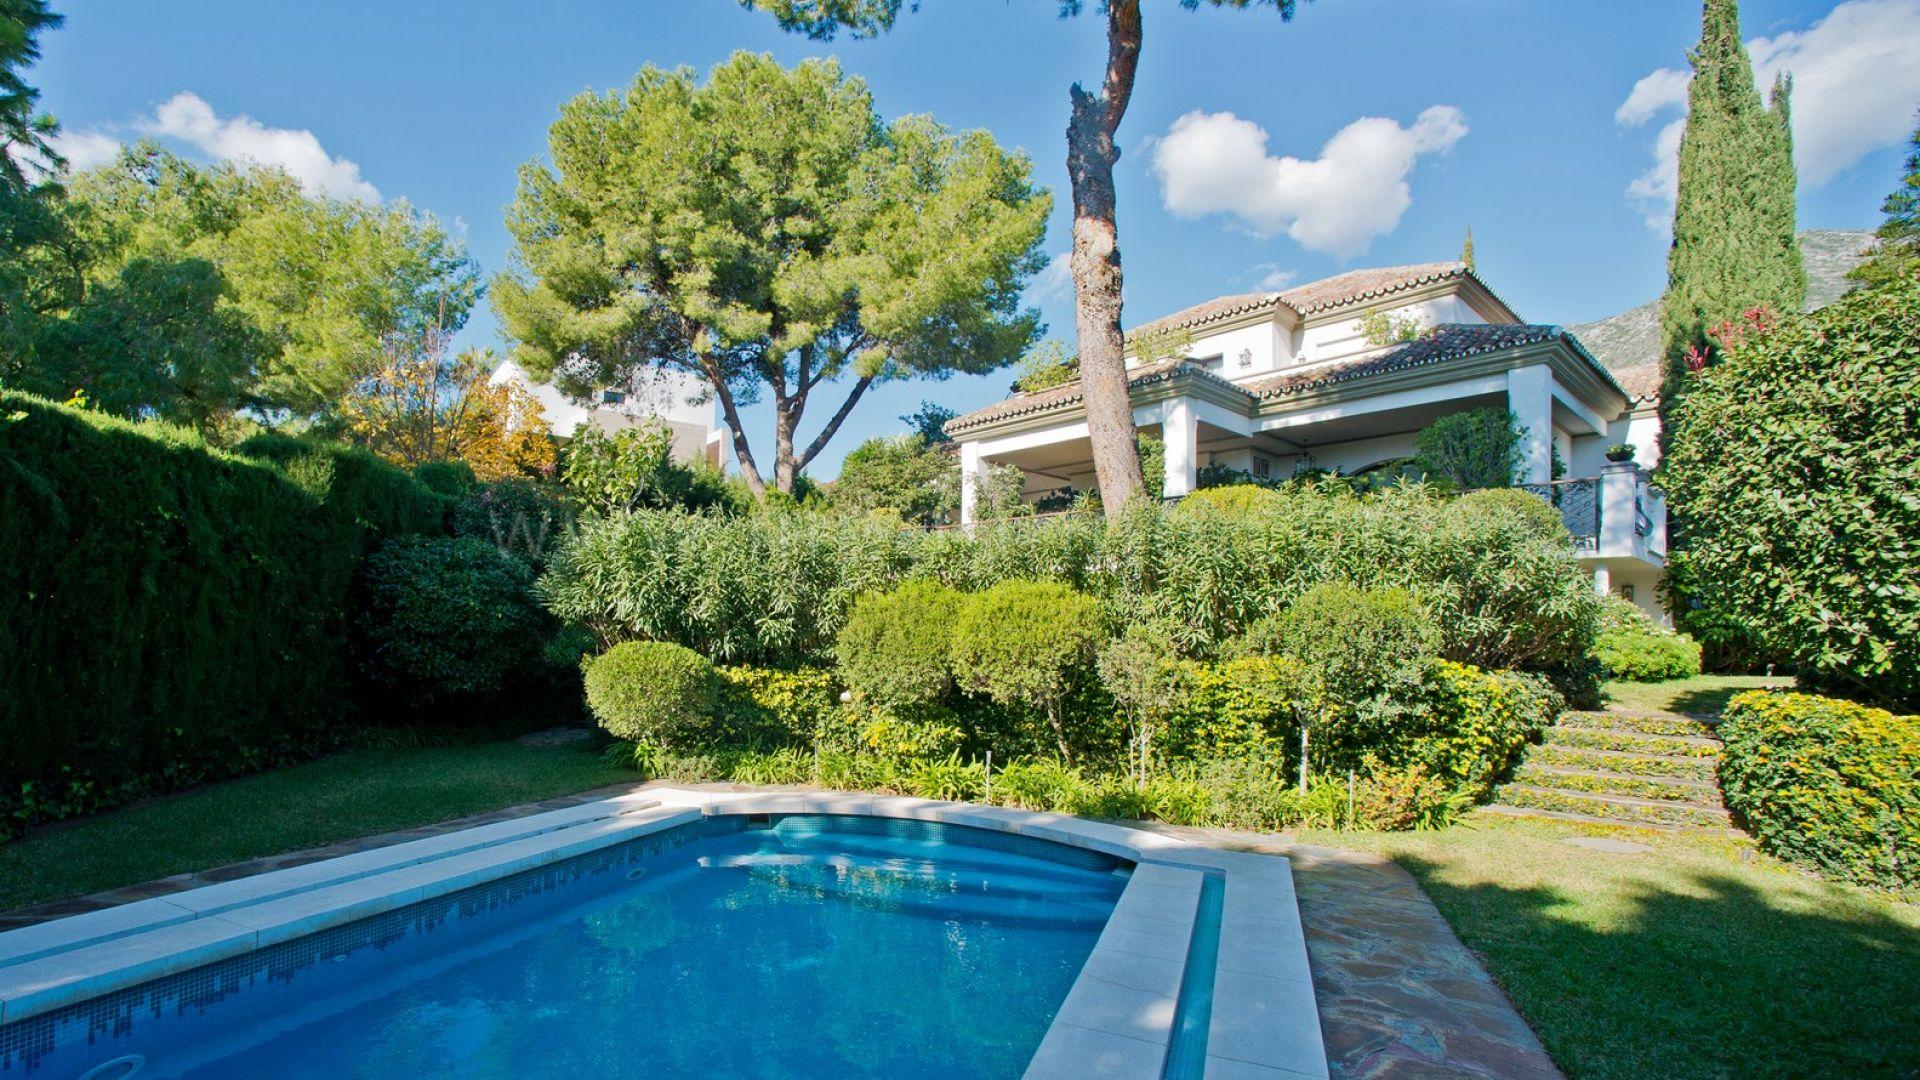 Immobilien zum Verkauf in Cascada de Camojan, Marbella Goldene Meile